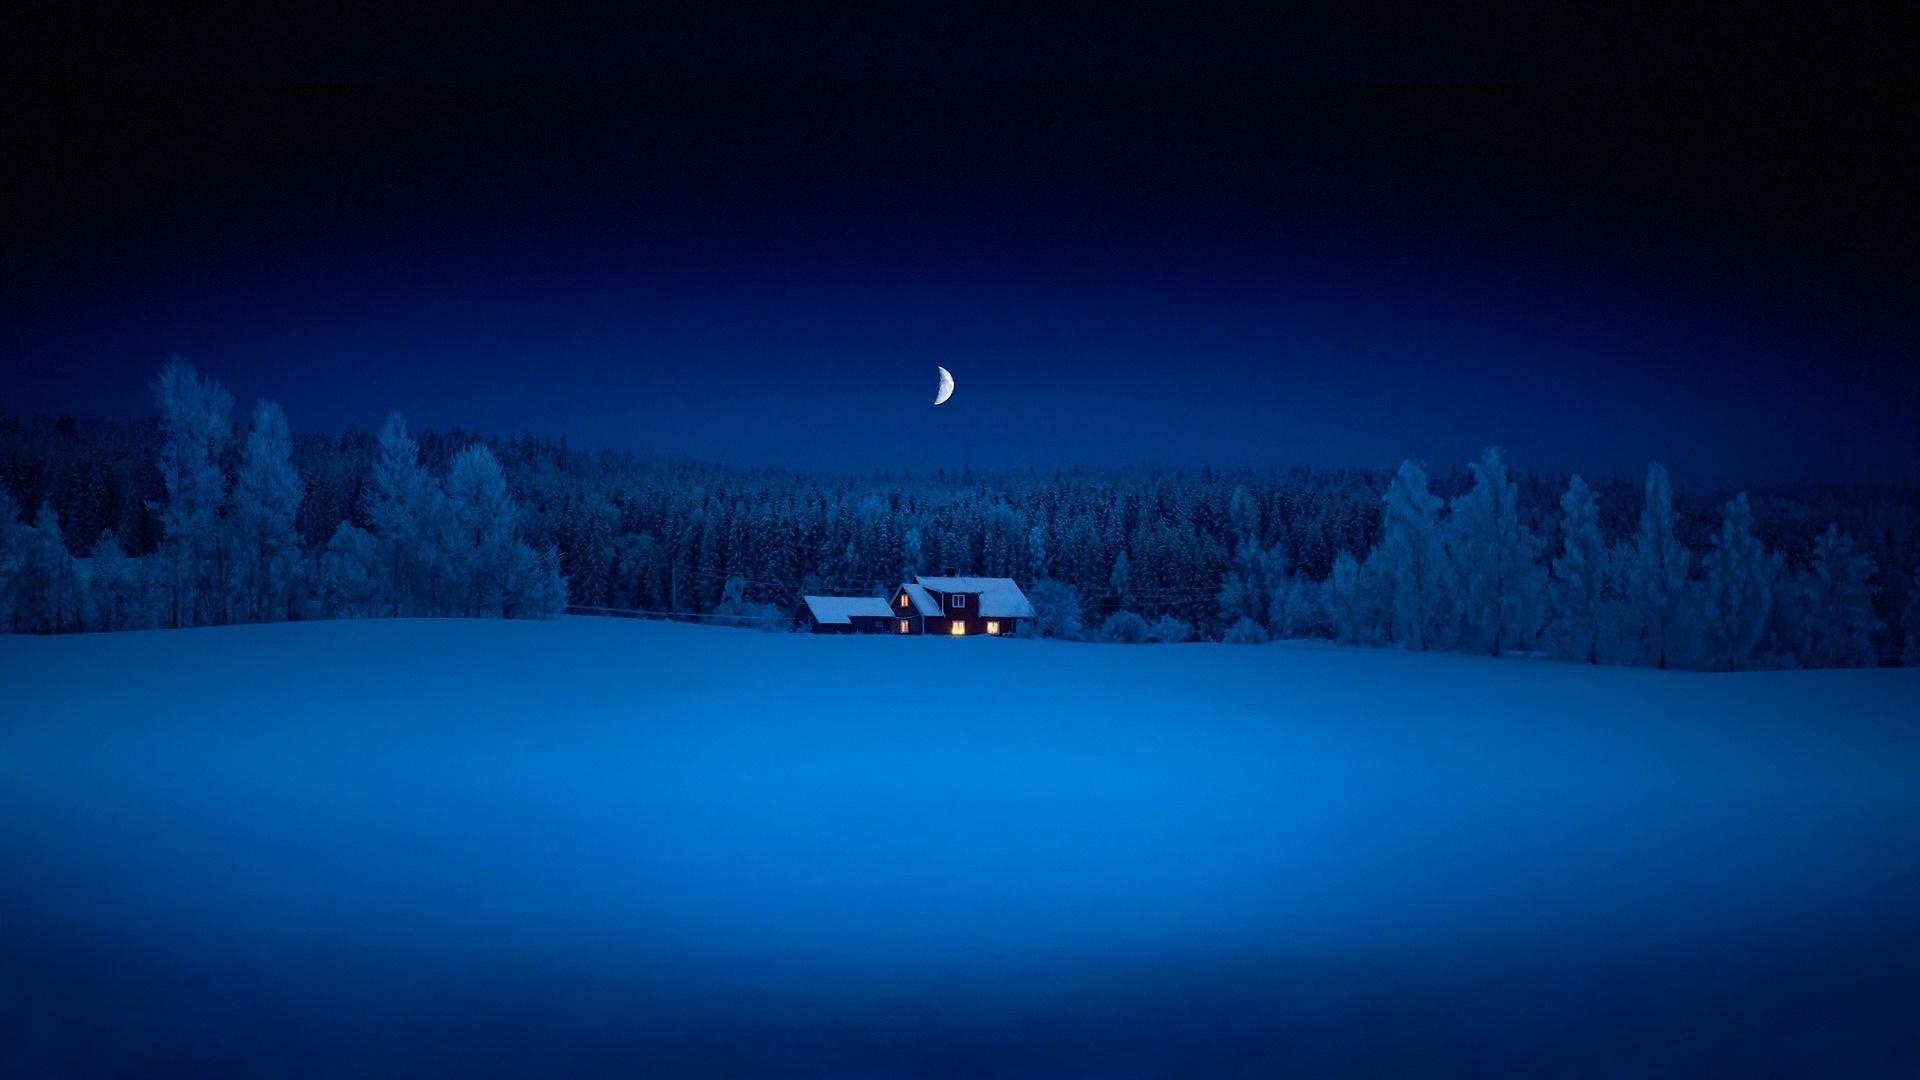 Обои Зима Темный Фон